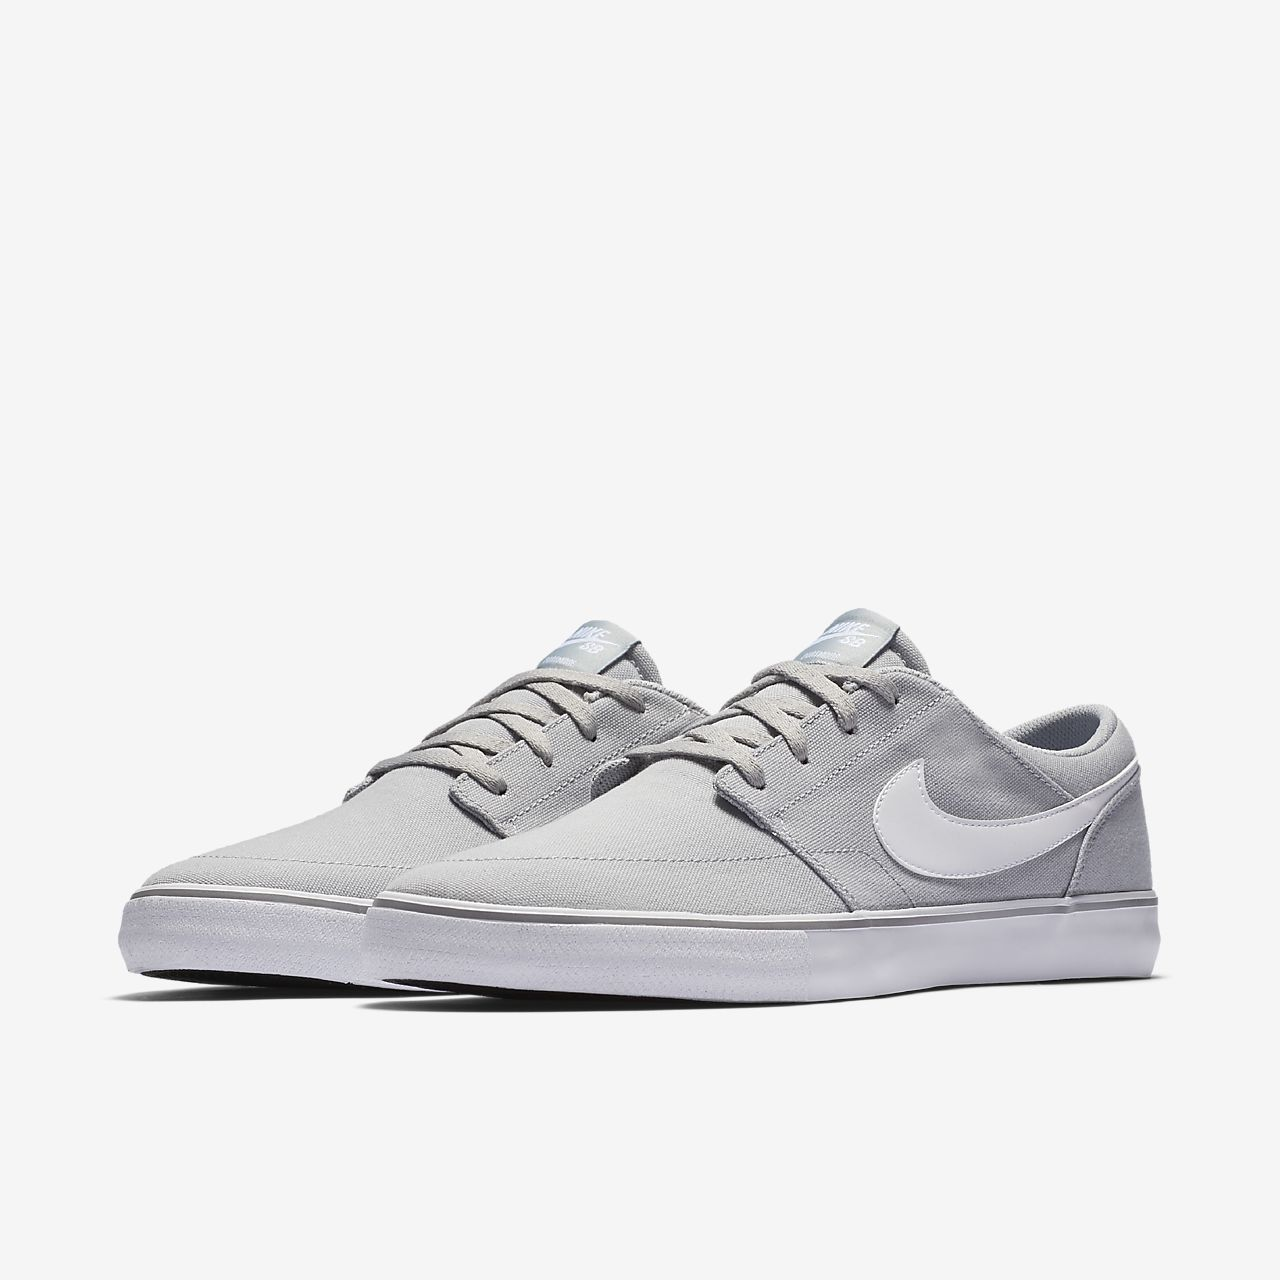 Portmore Nike SB BMRxthscn